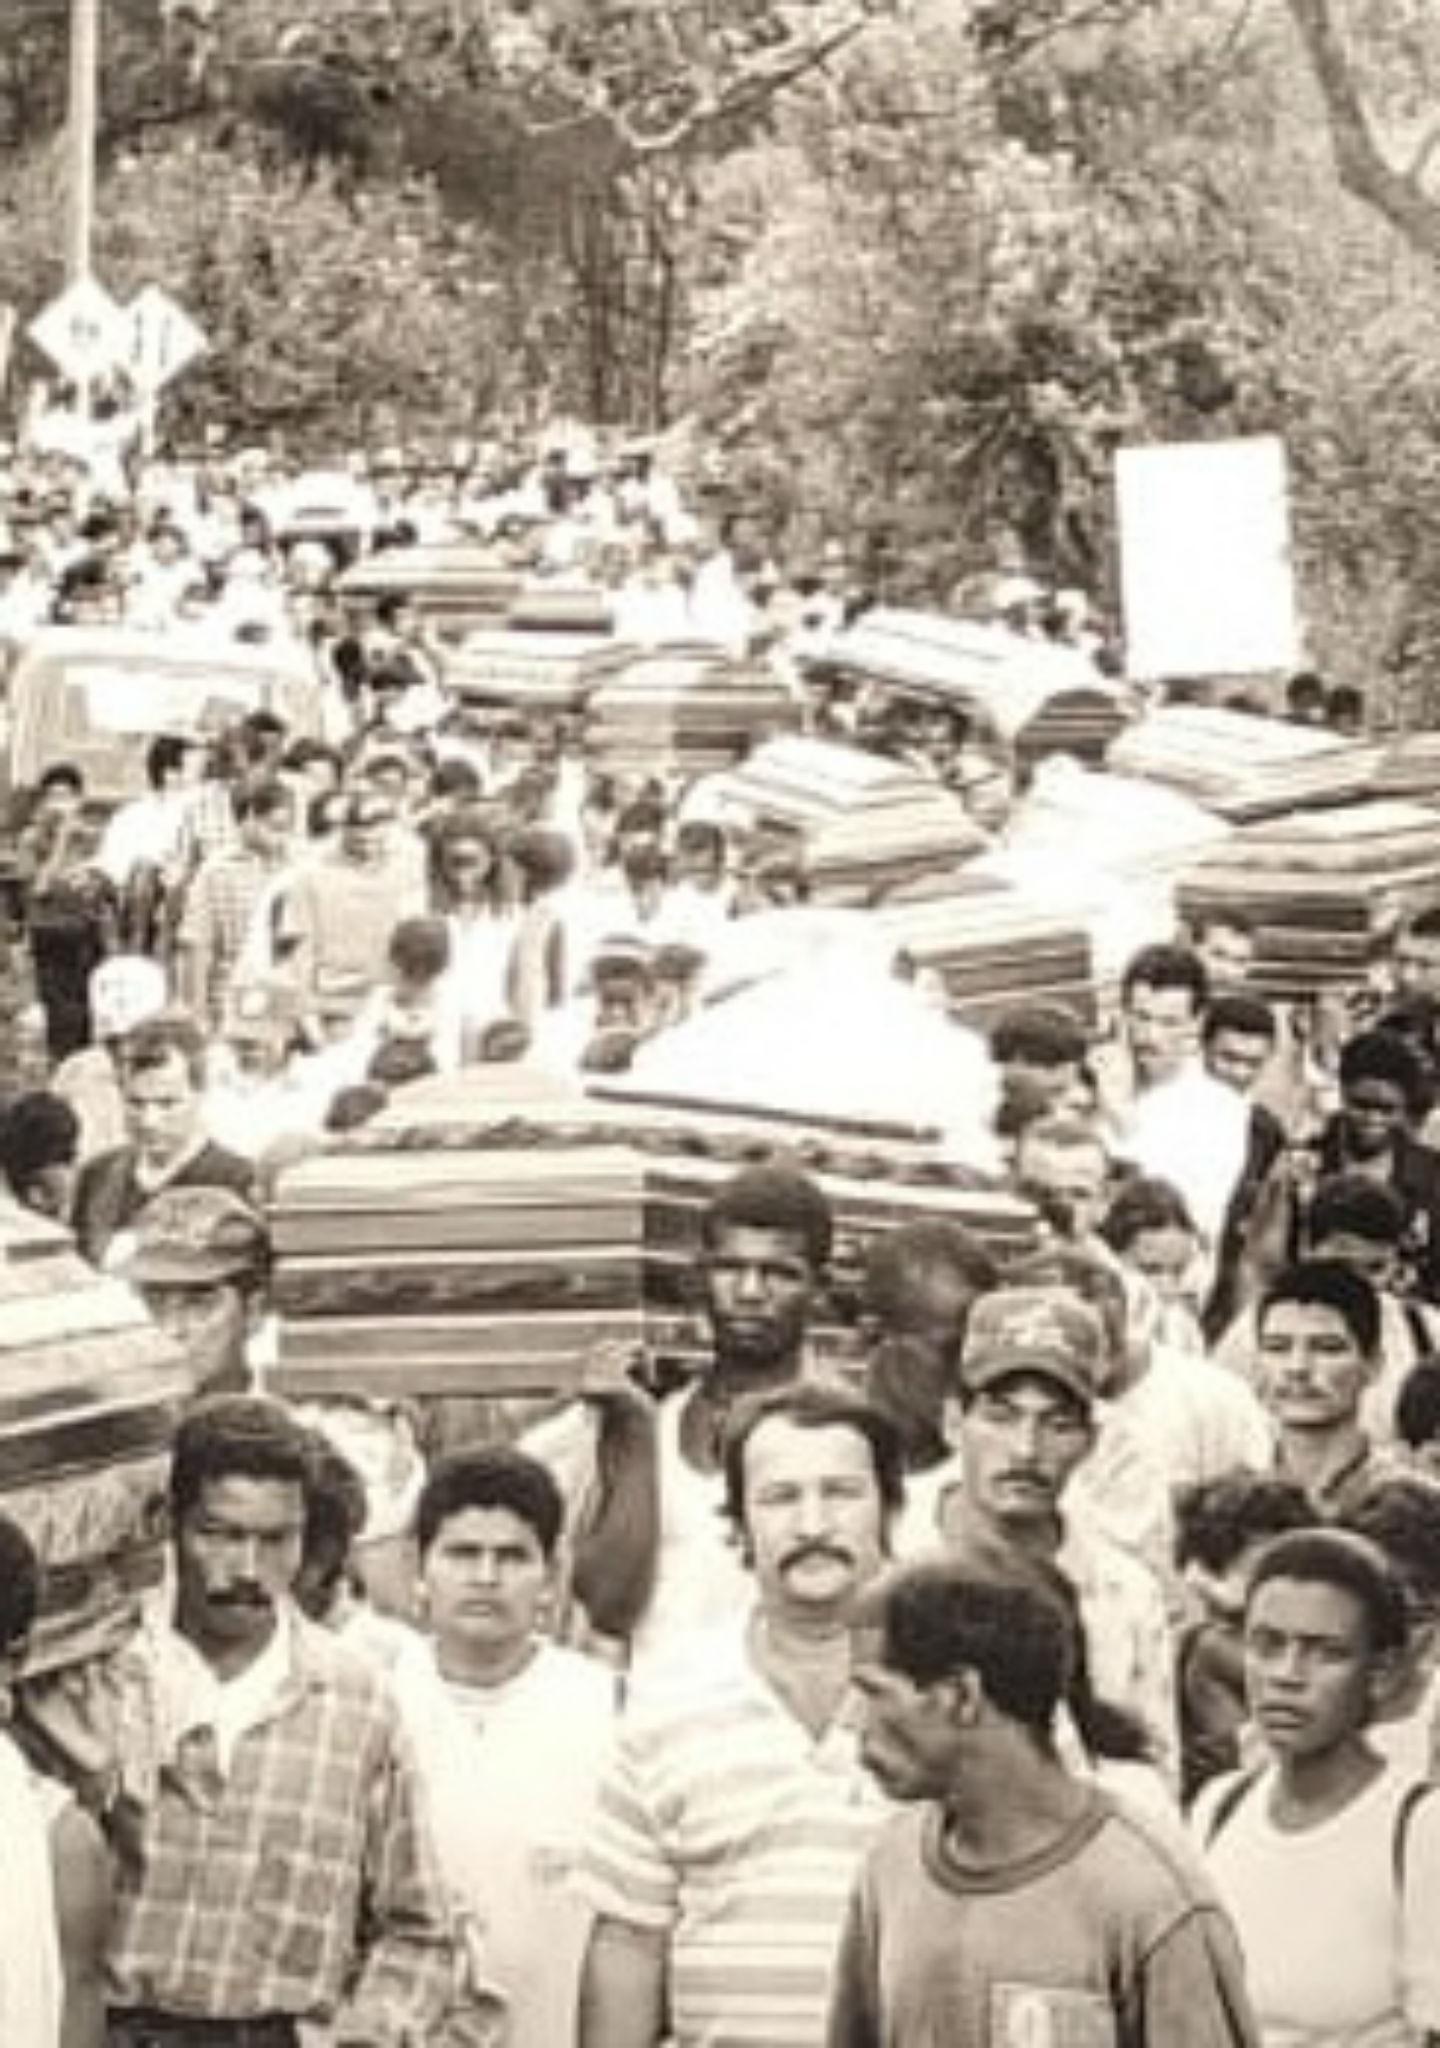 Entierro multitudinario de Machuca. Antioquia 1998